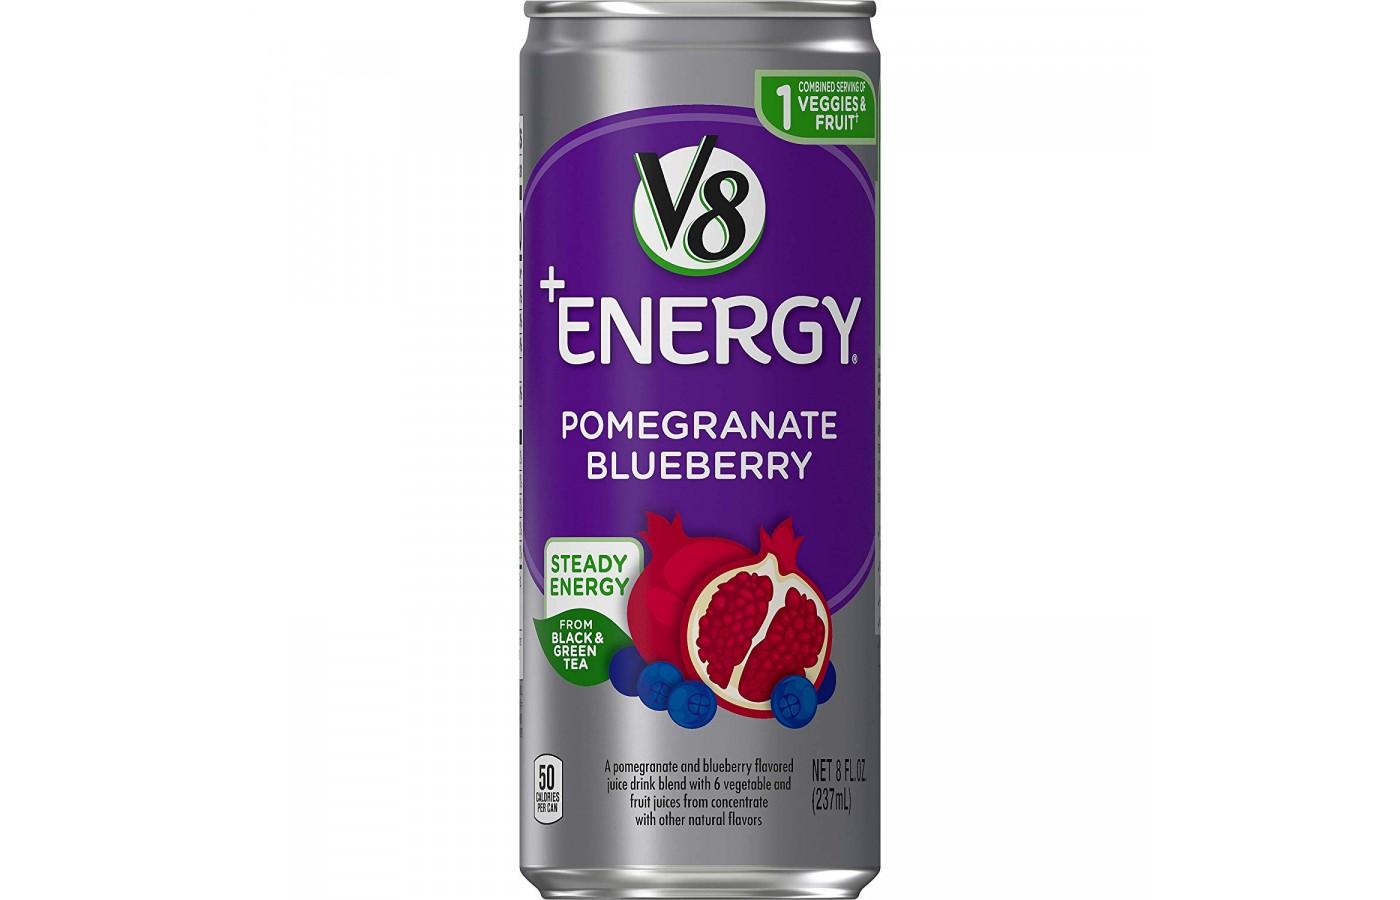 V8EnergySingle